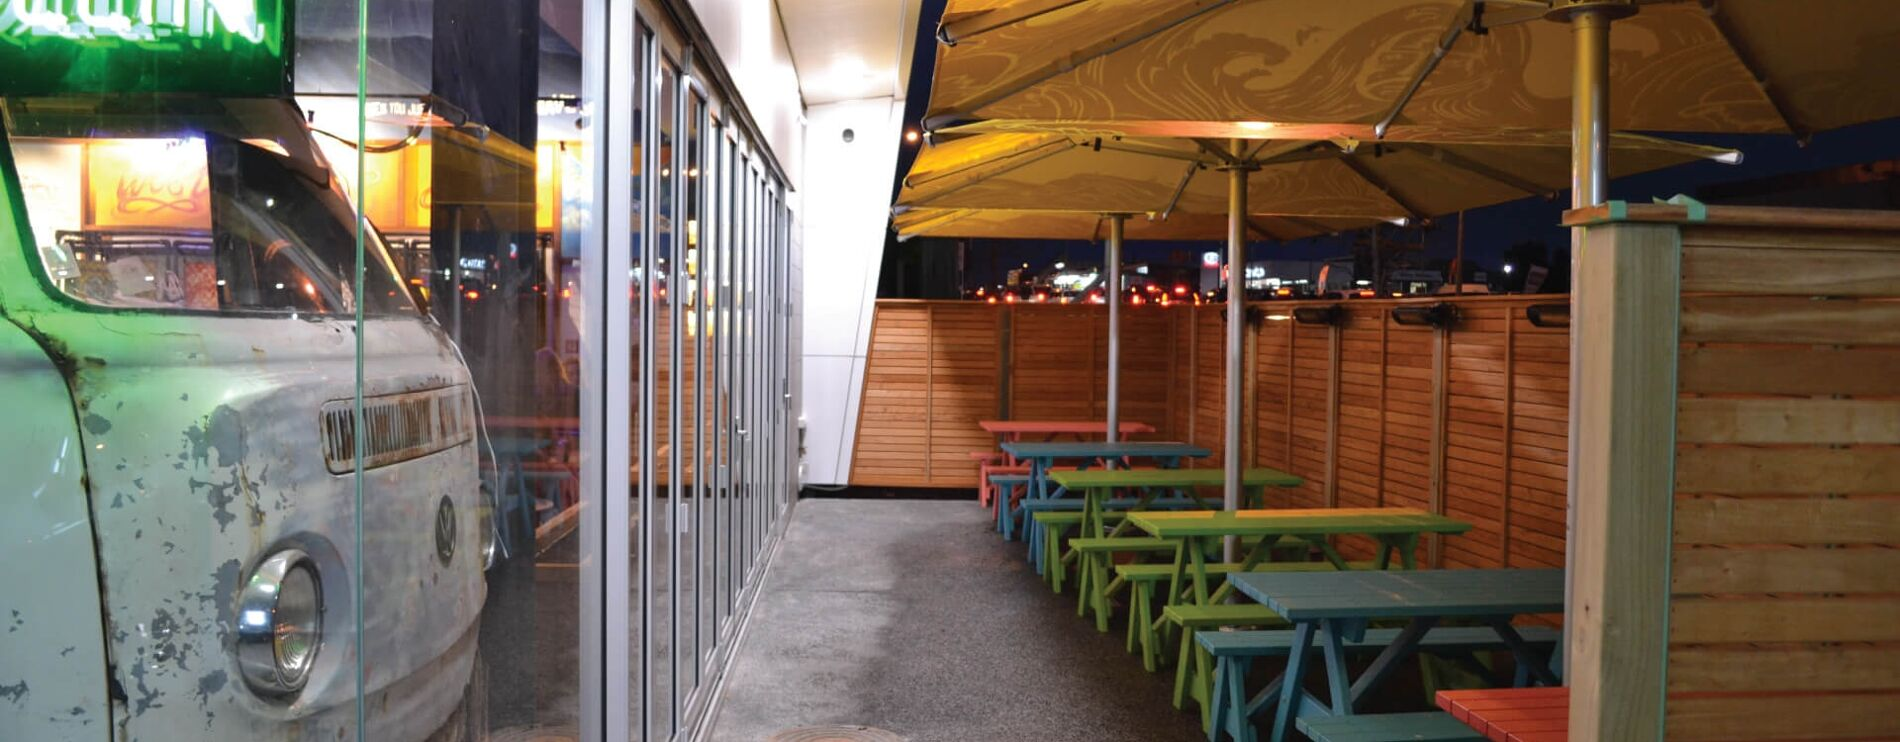 Commercial Outdoor Umbrellas with Branding